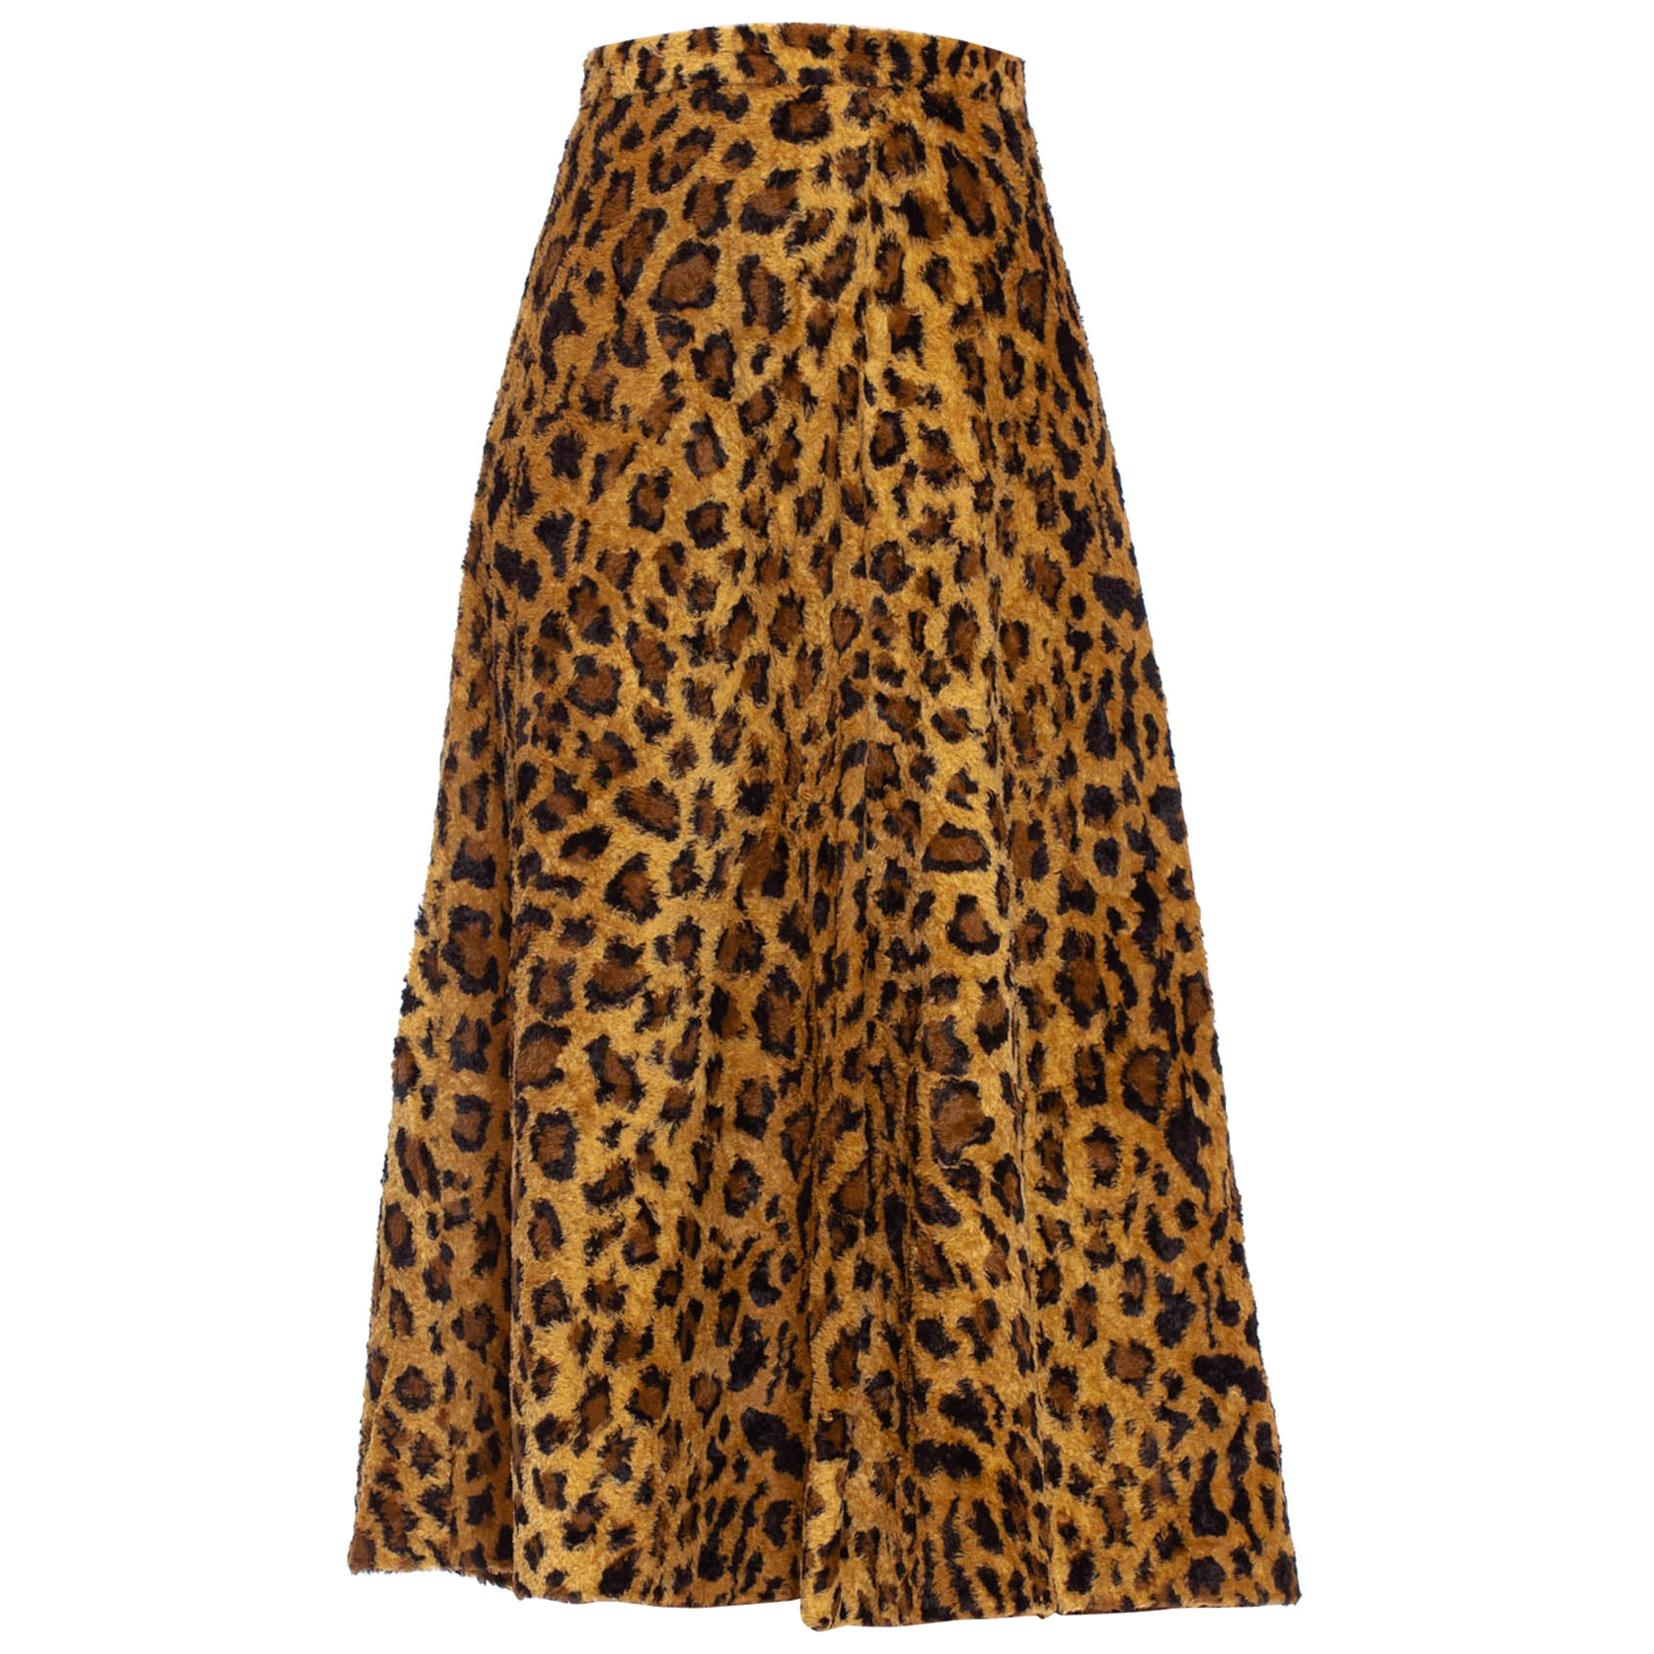 1940S Leopard Print Cotton & Rayon Faux Fur Early Rockabilly Skirt